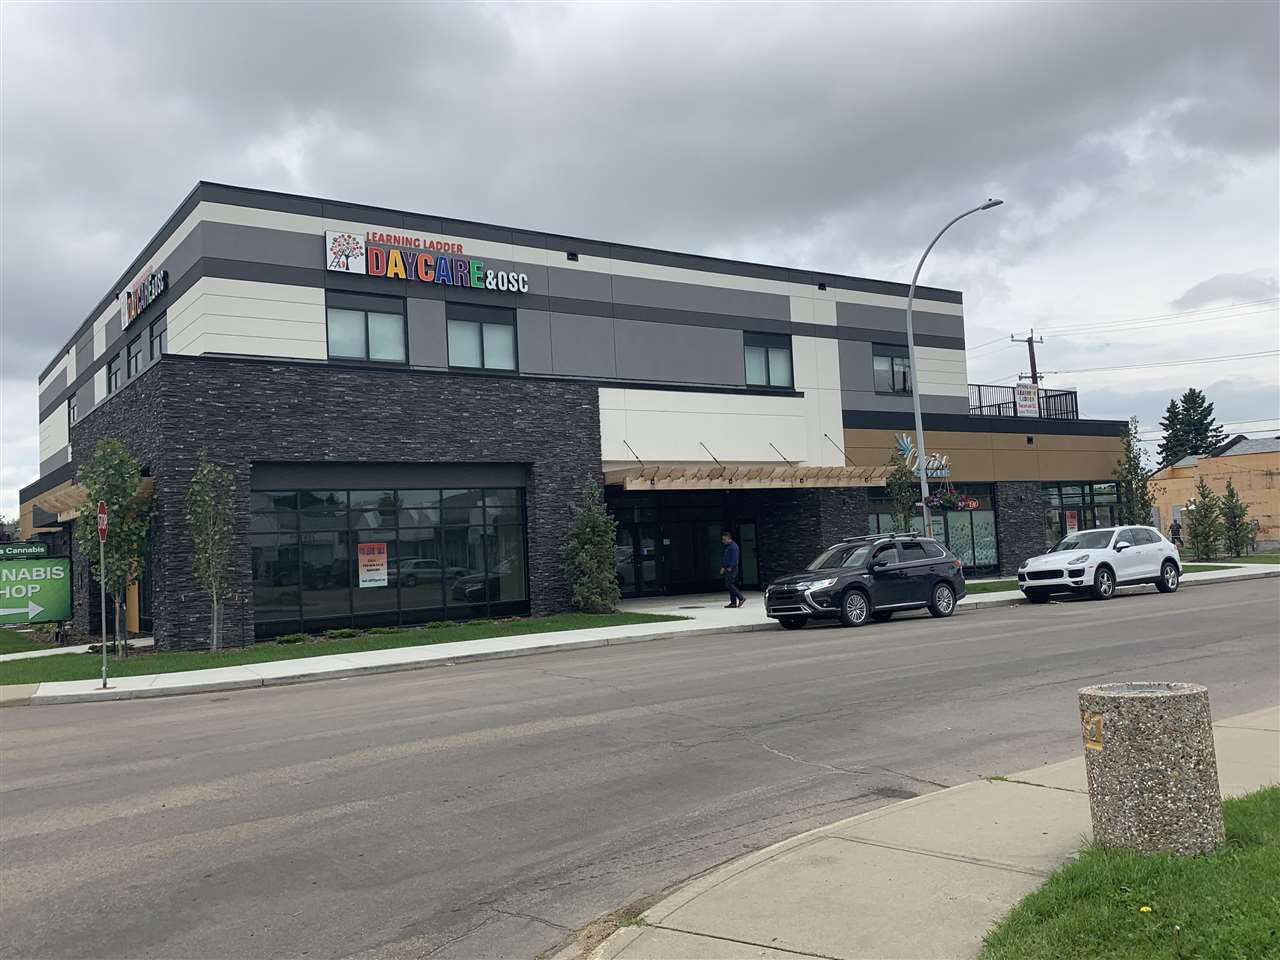 Main Photo: 15802 100 Avenue NW in Edmonton: Zone 22 Retail for lease : MLS®# E4207878